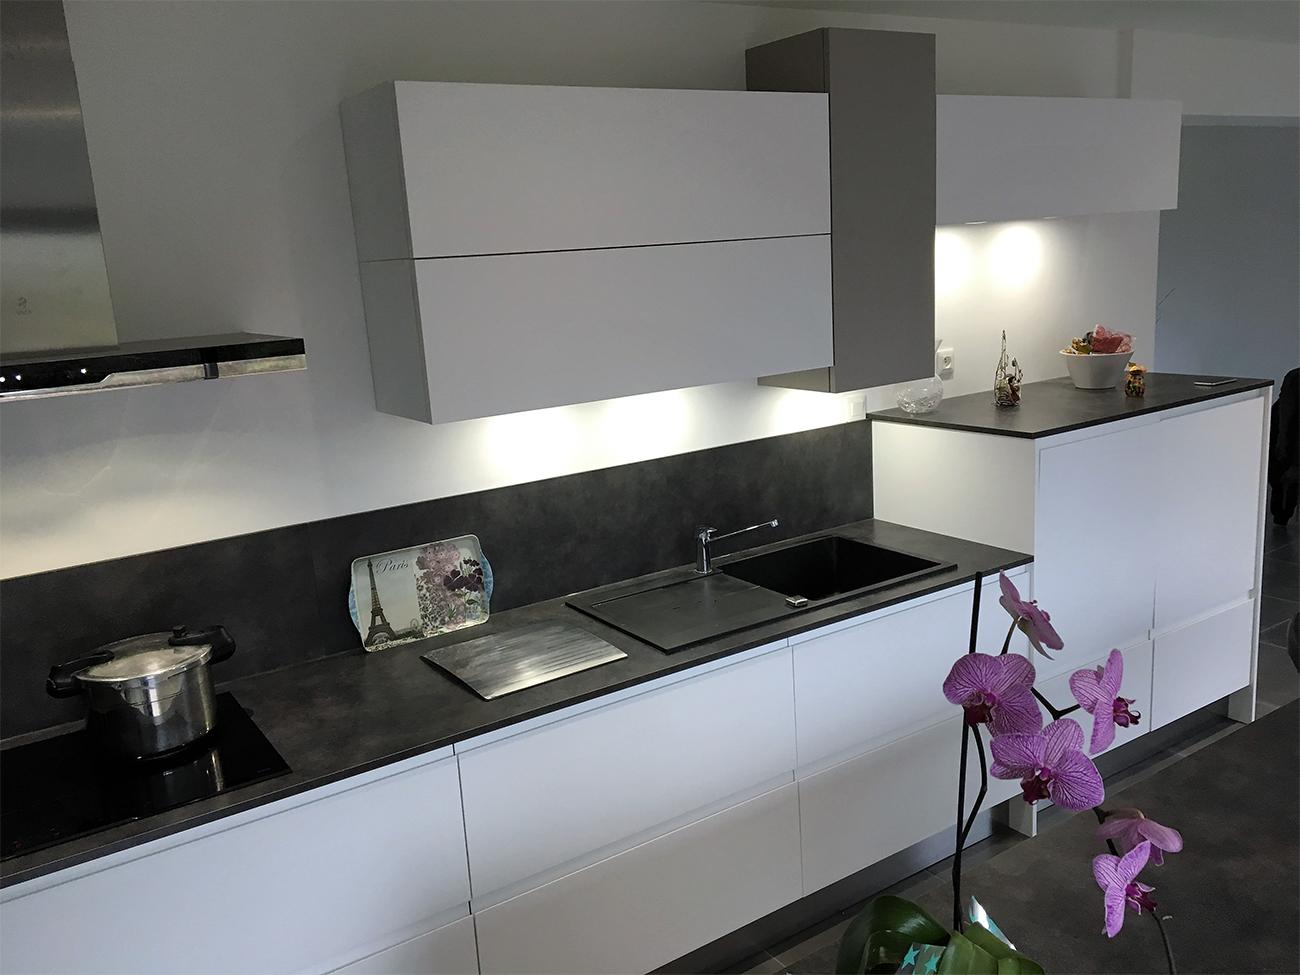 cuisine quipe ilot central modle rondo duixina cuisine quipe cuisine amnage with cuisine quipe. Black Bedroom Furniture Sets. Home Design Ideas